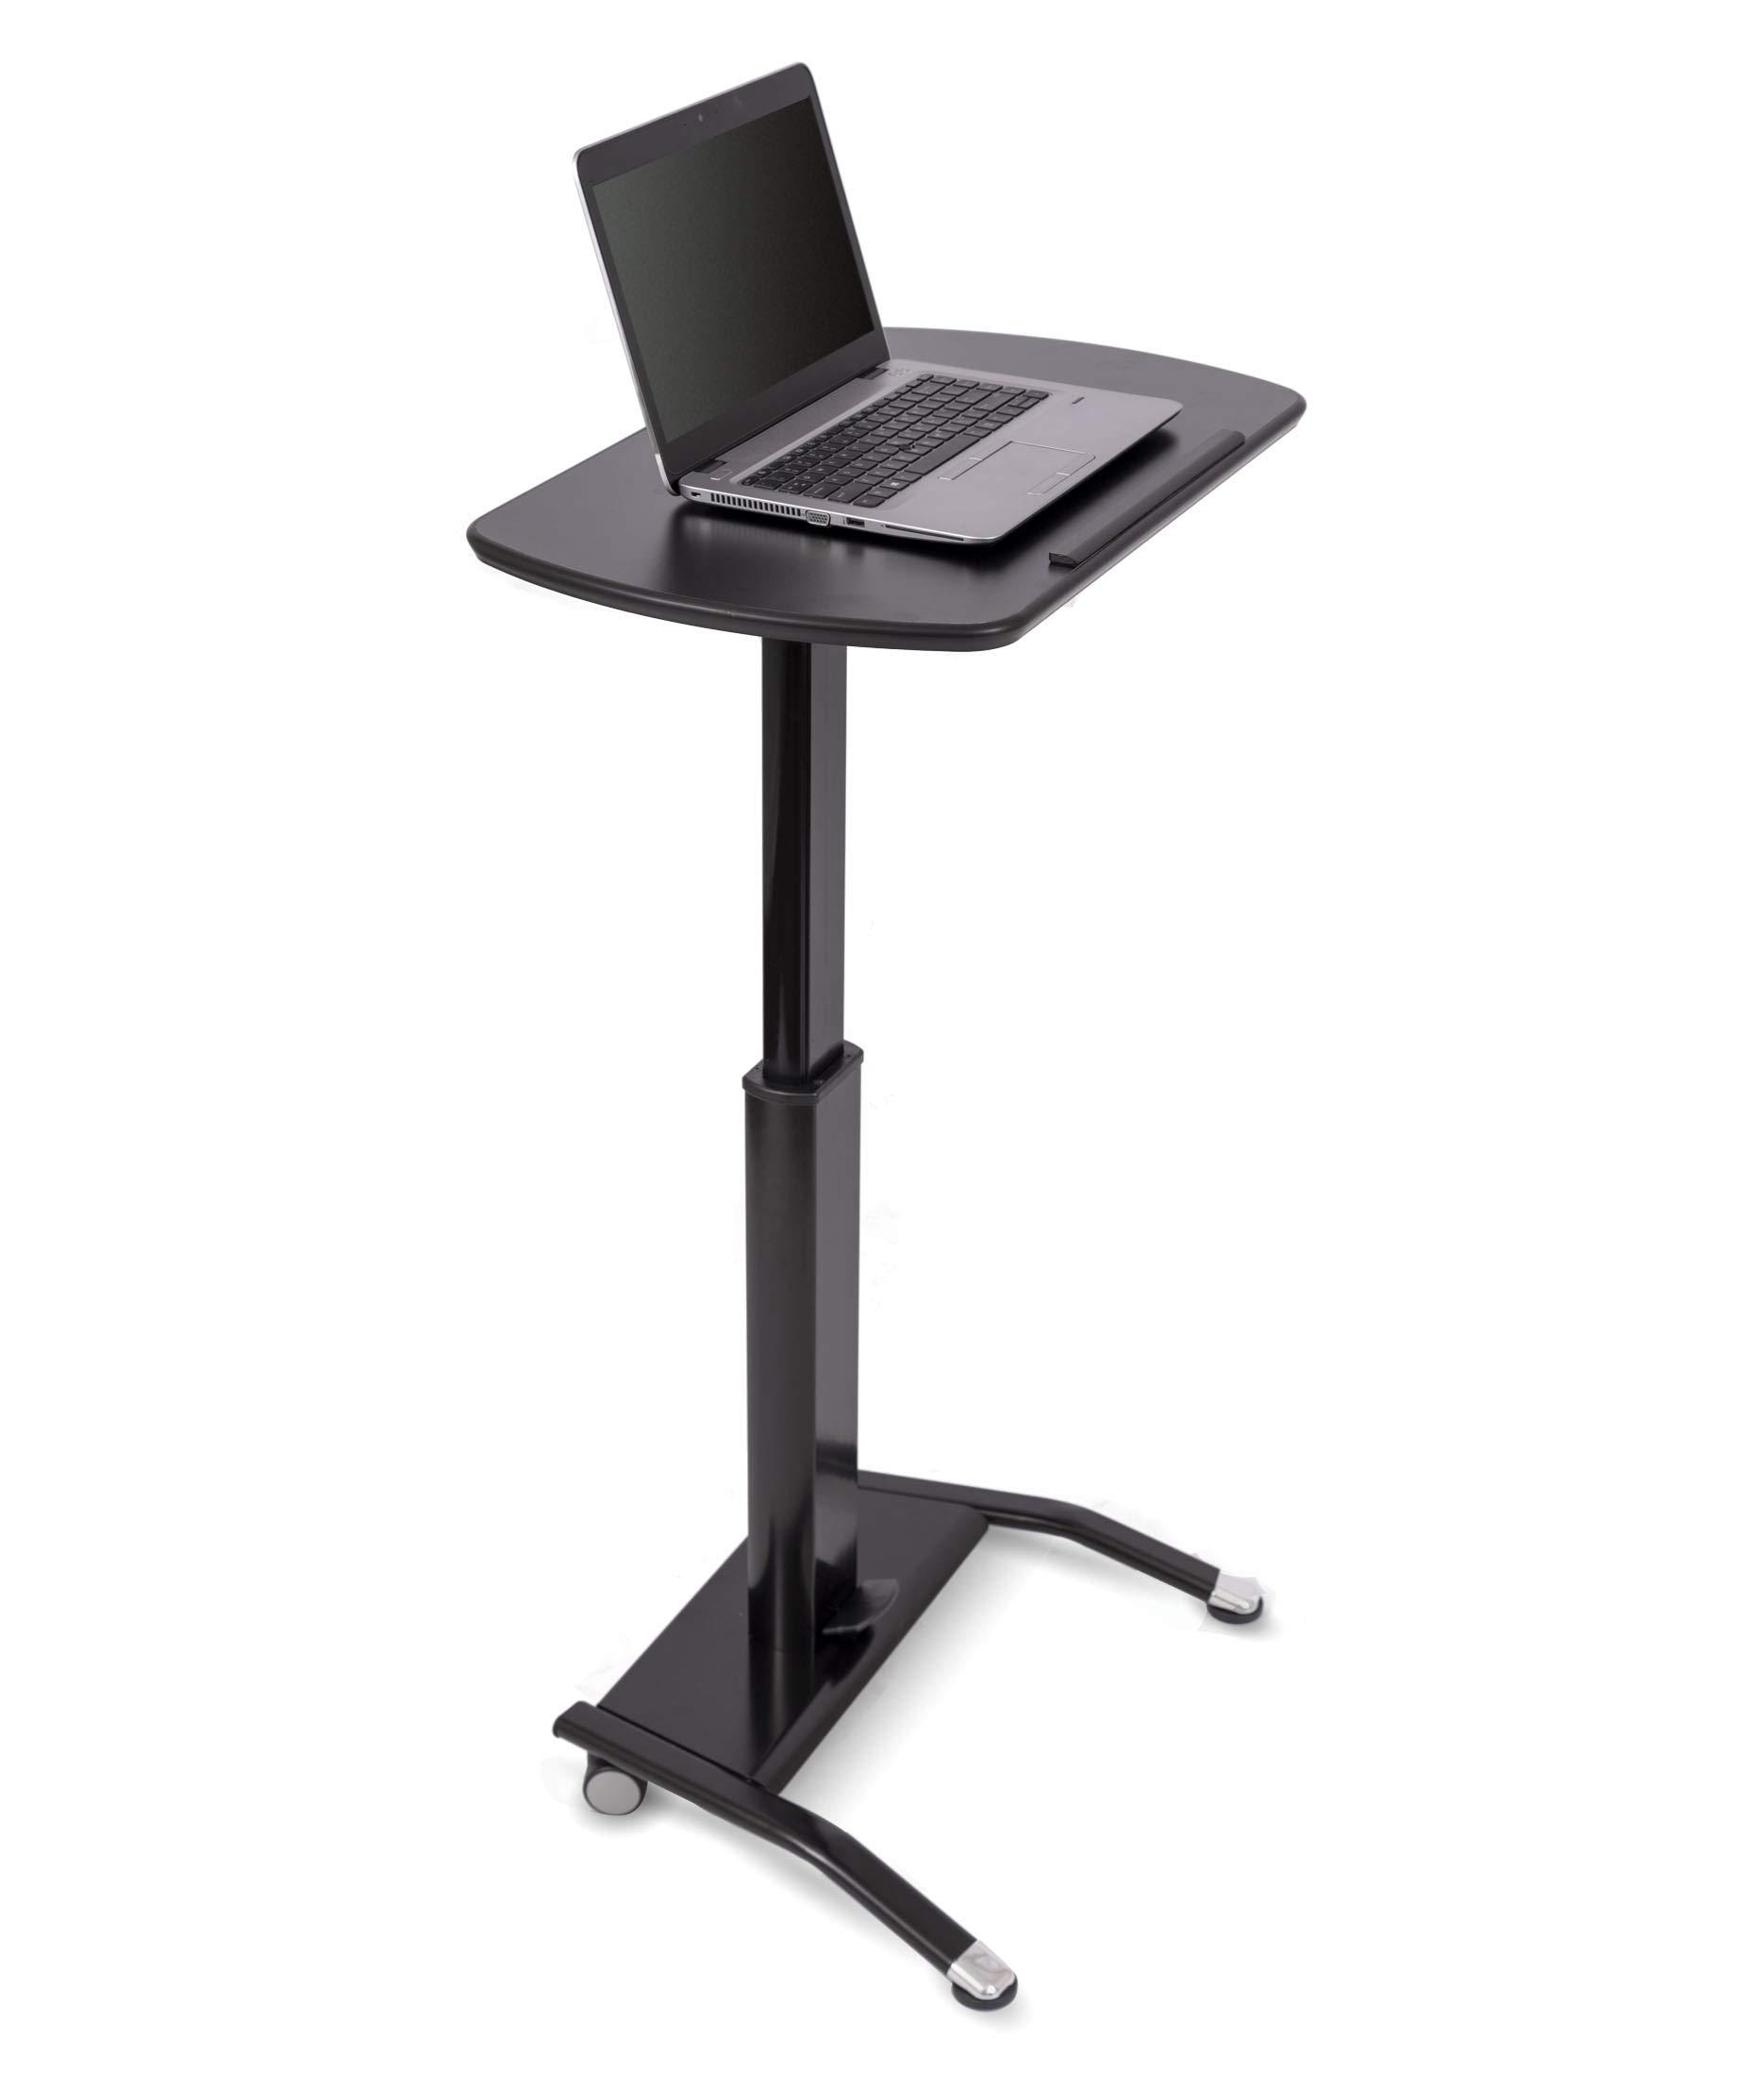 Pneumatic Adjustable-Height Lectern (Black)